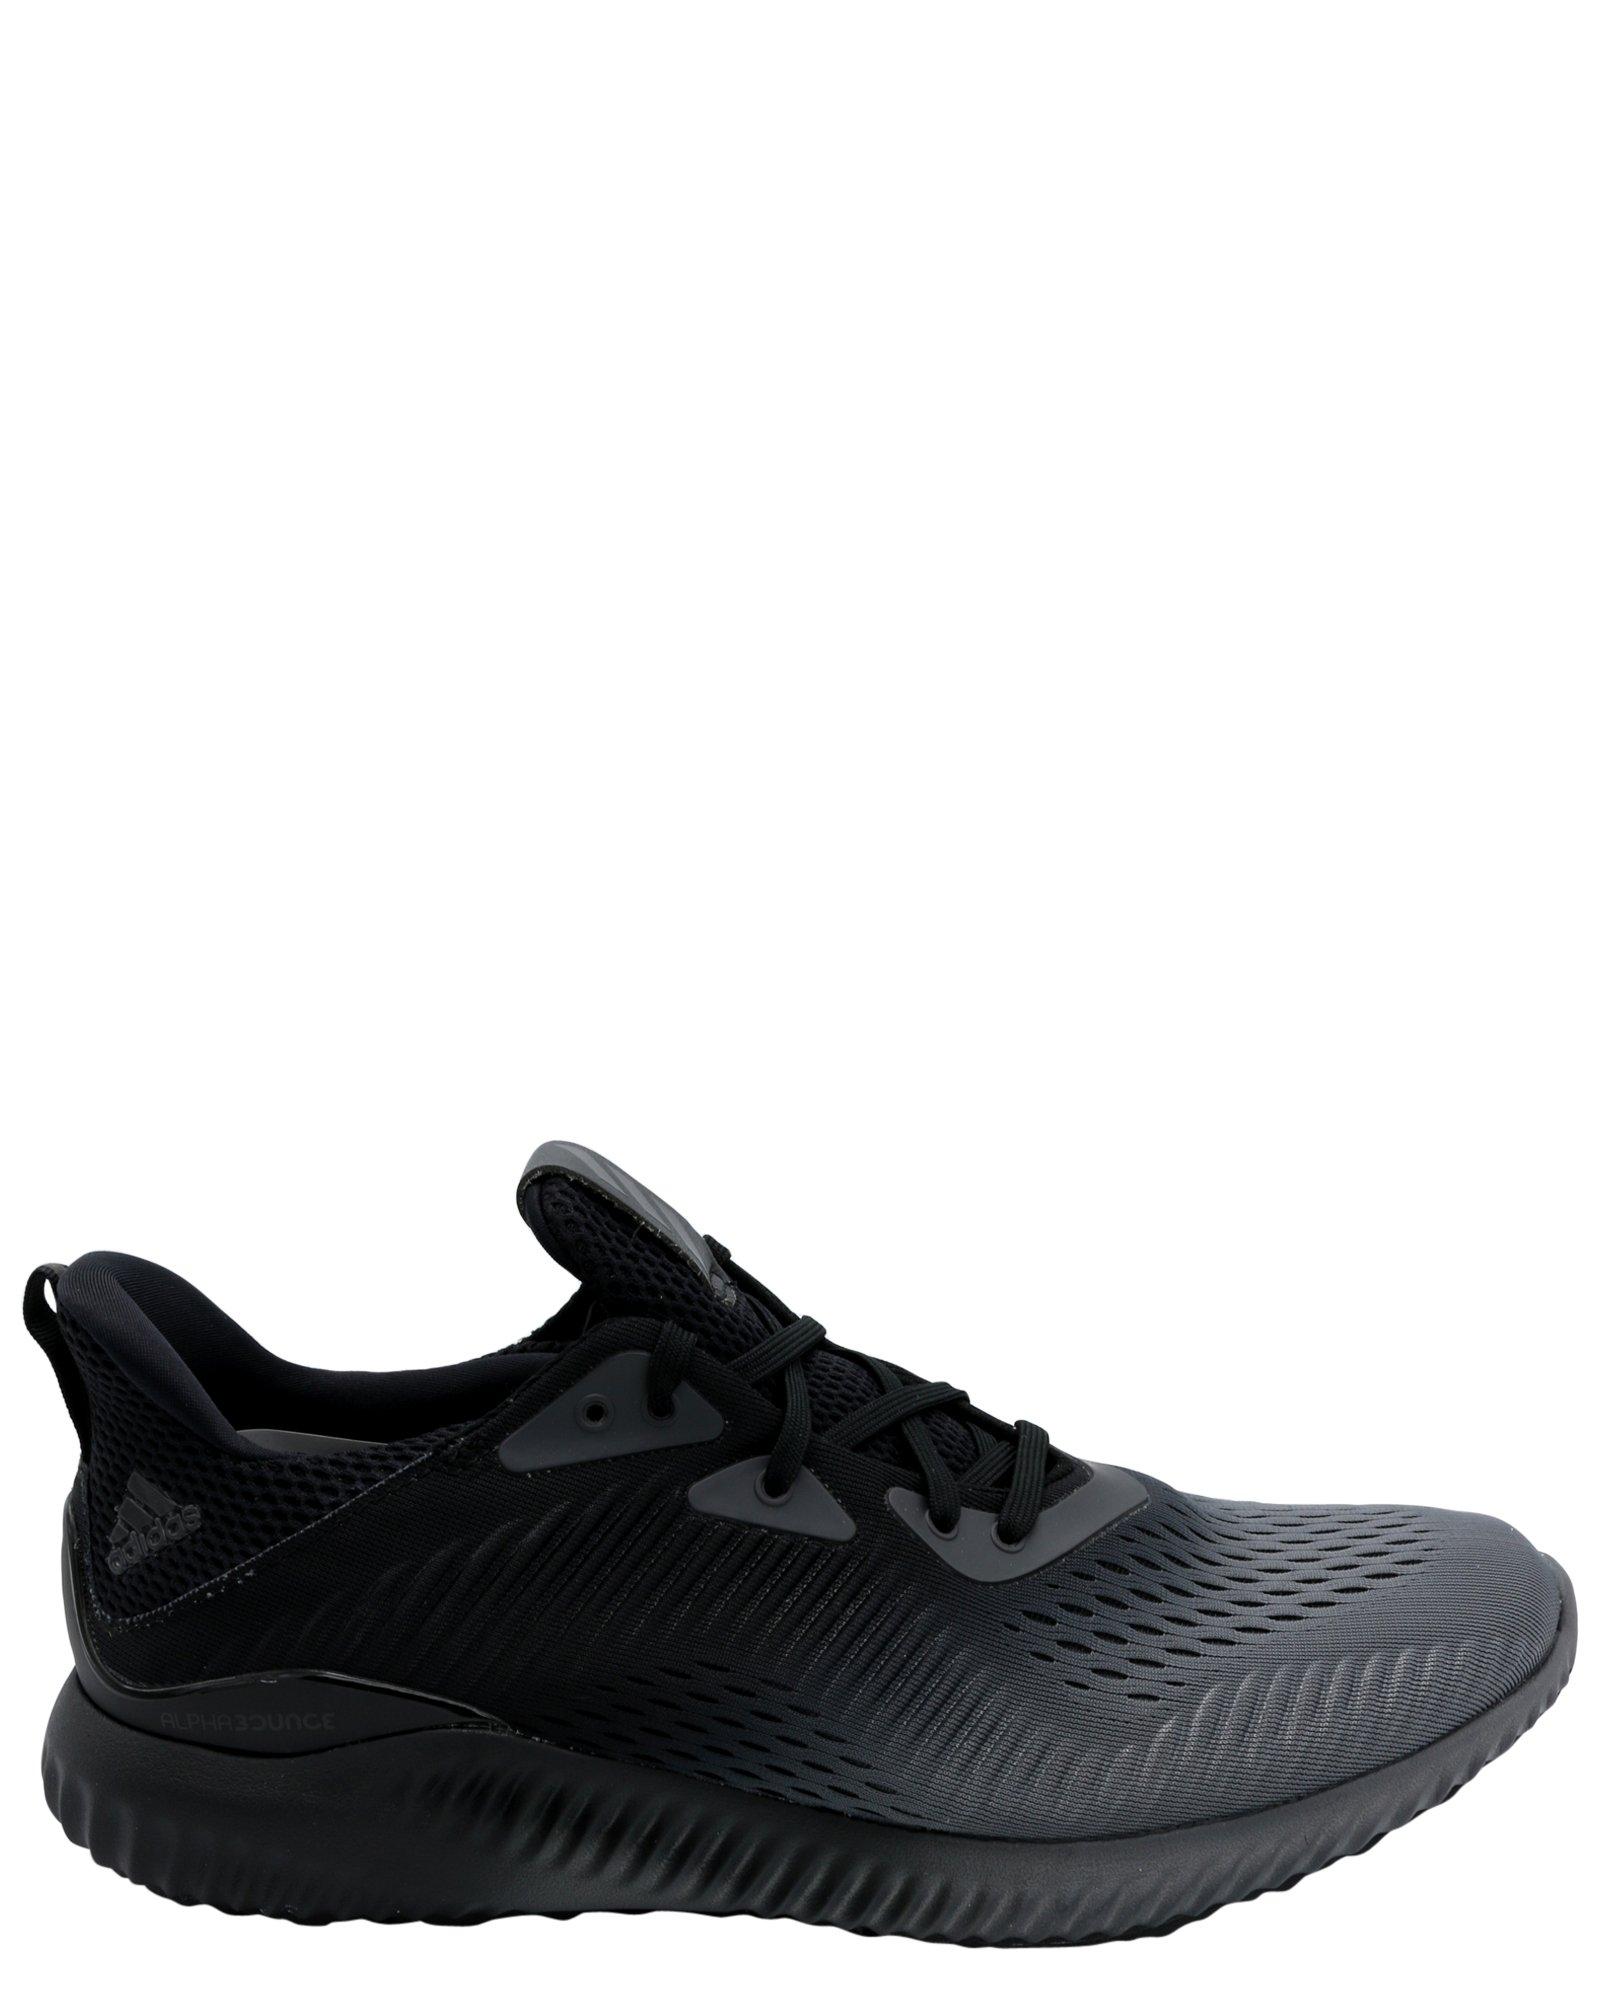 9f139bb45c070 Galleon - Adidas Men s Alphabounce Em M Running Shoe